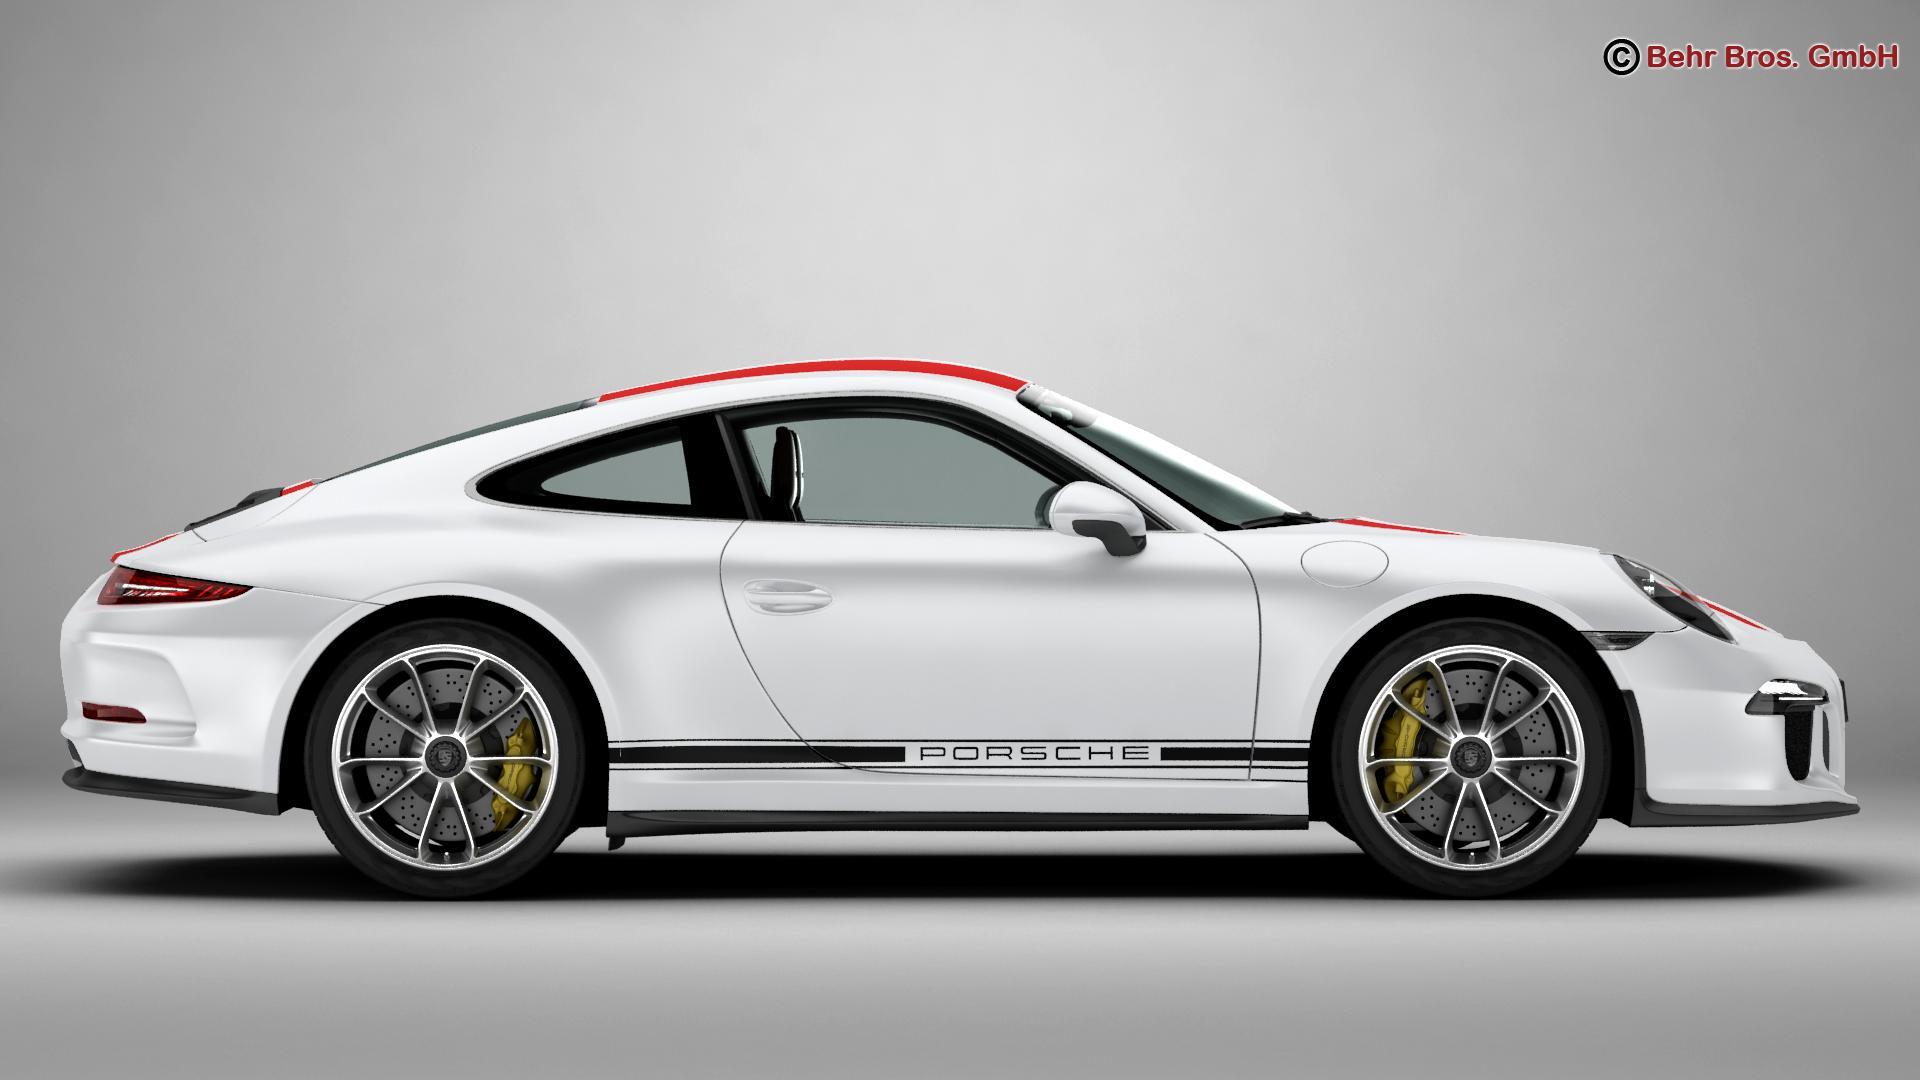 porsche 911 r 2017 3d model 3ds max fbx c4d lwo ma mb obj 220004